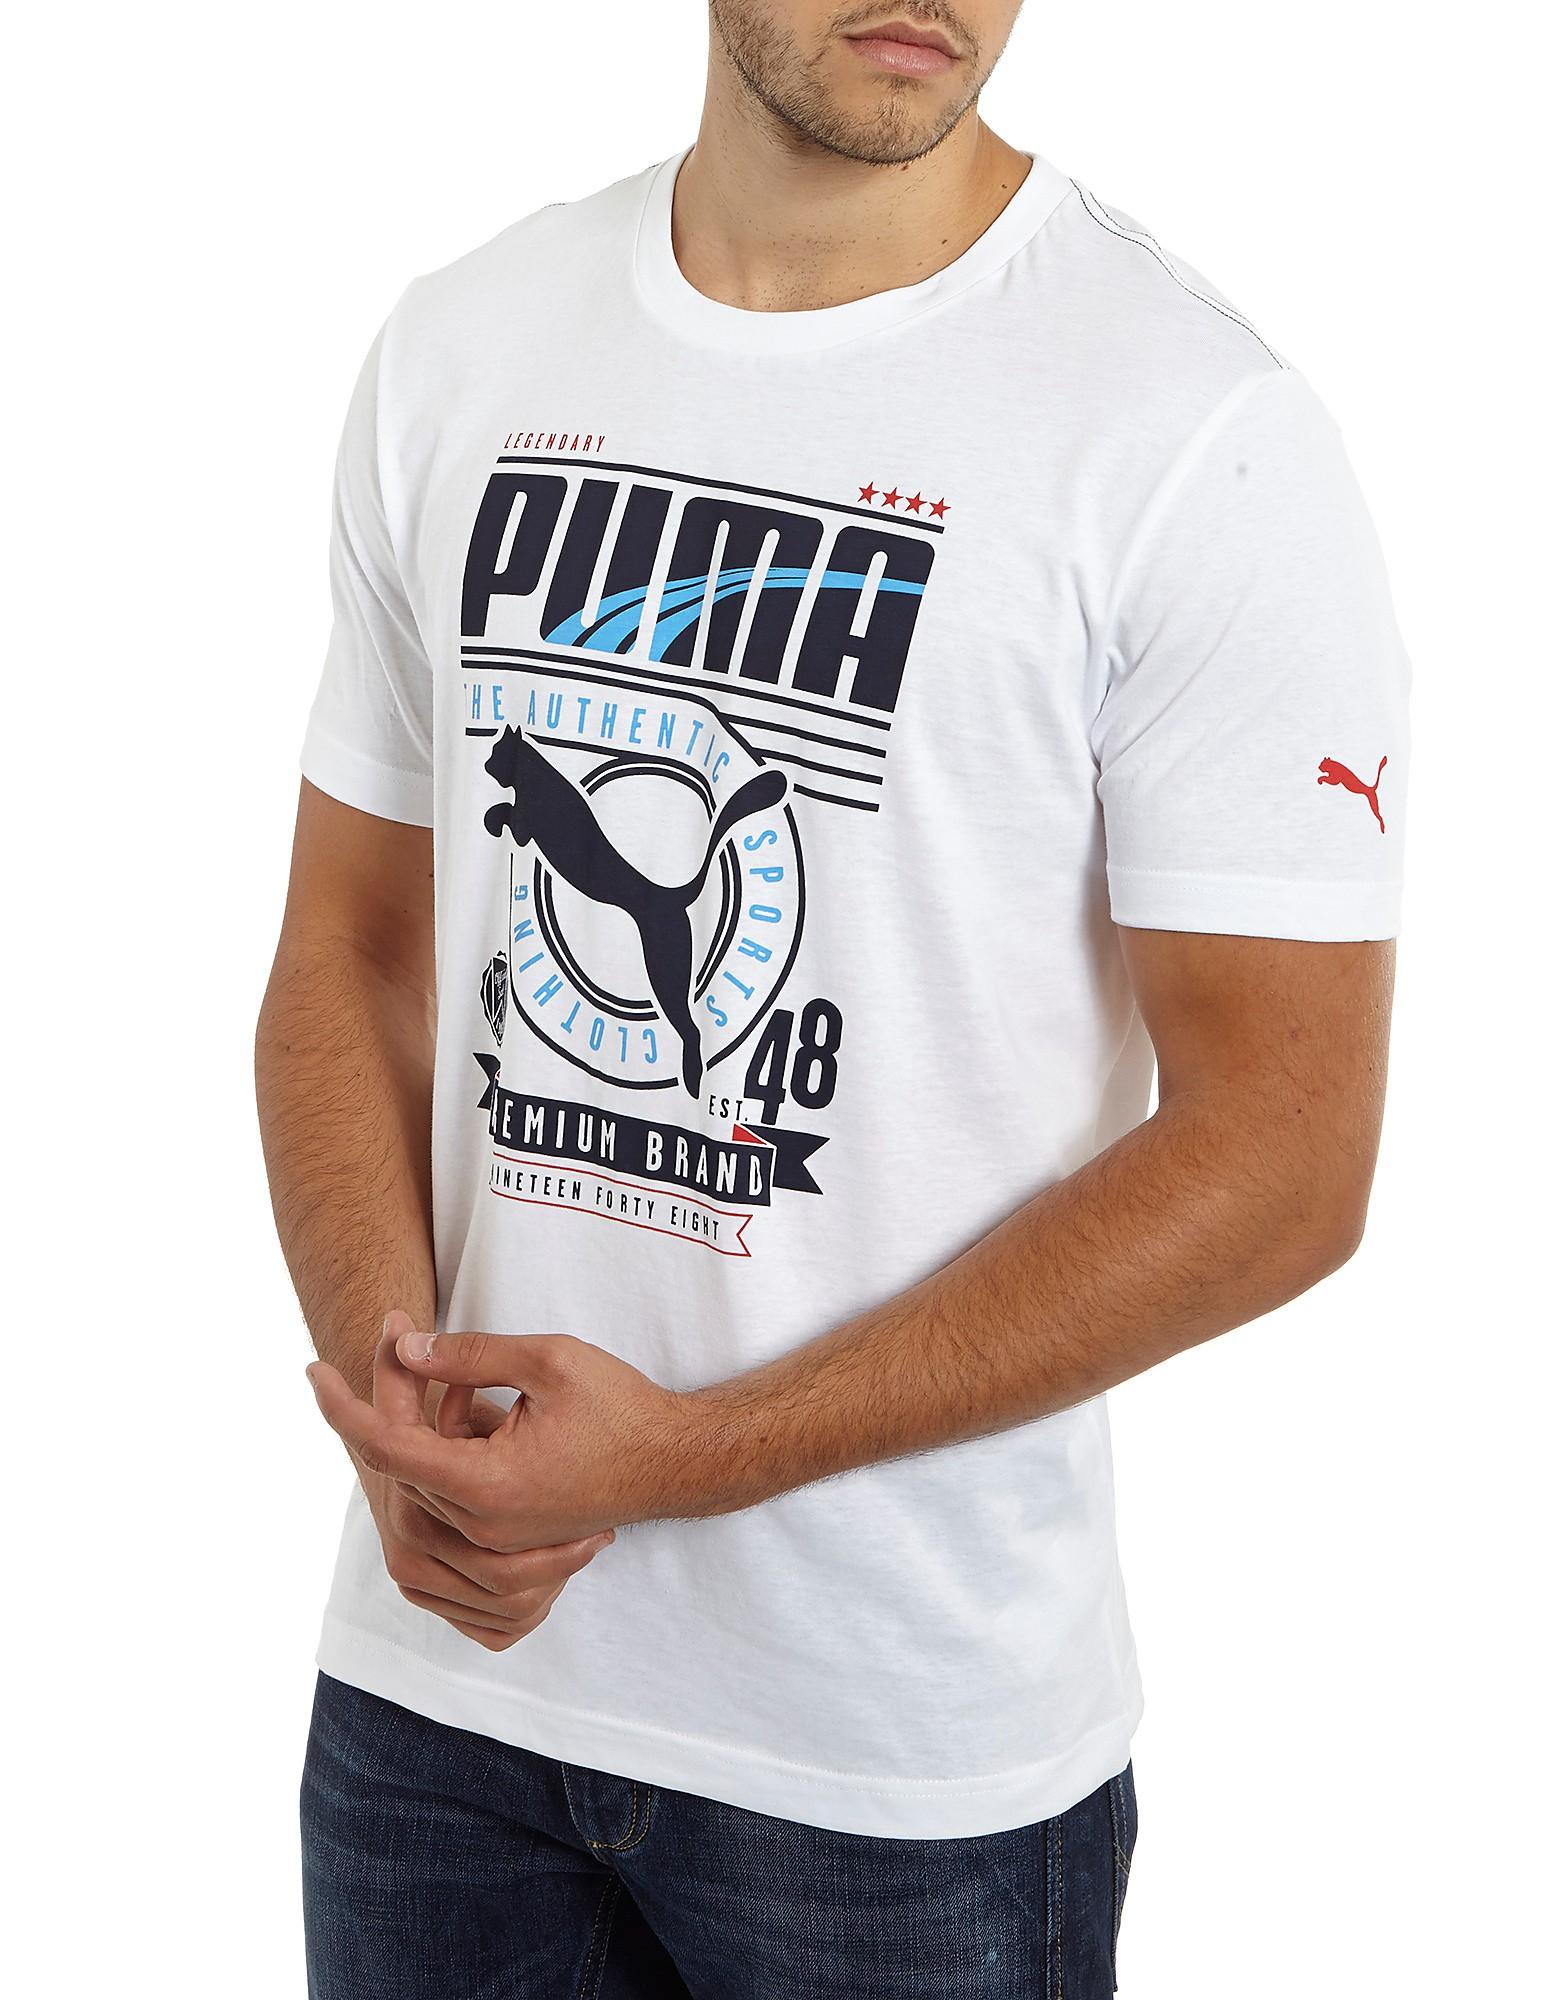 Puma Premium T-Shirt product image